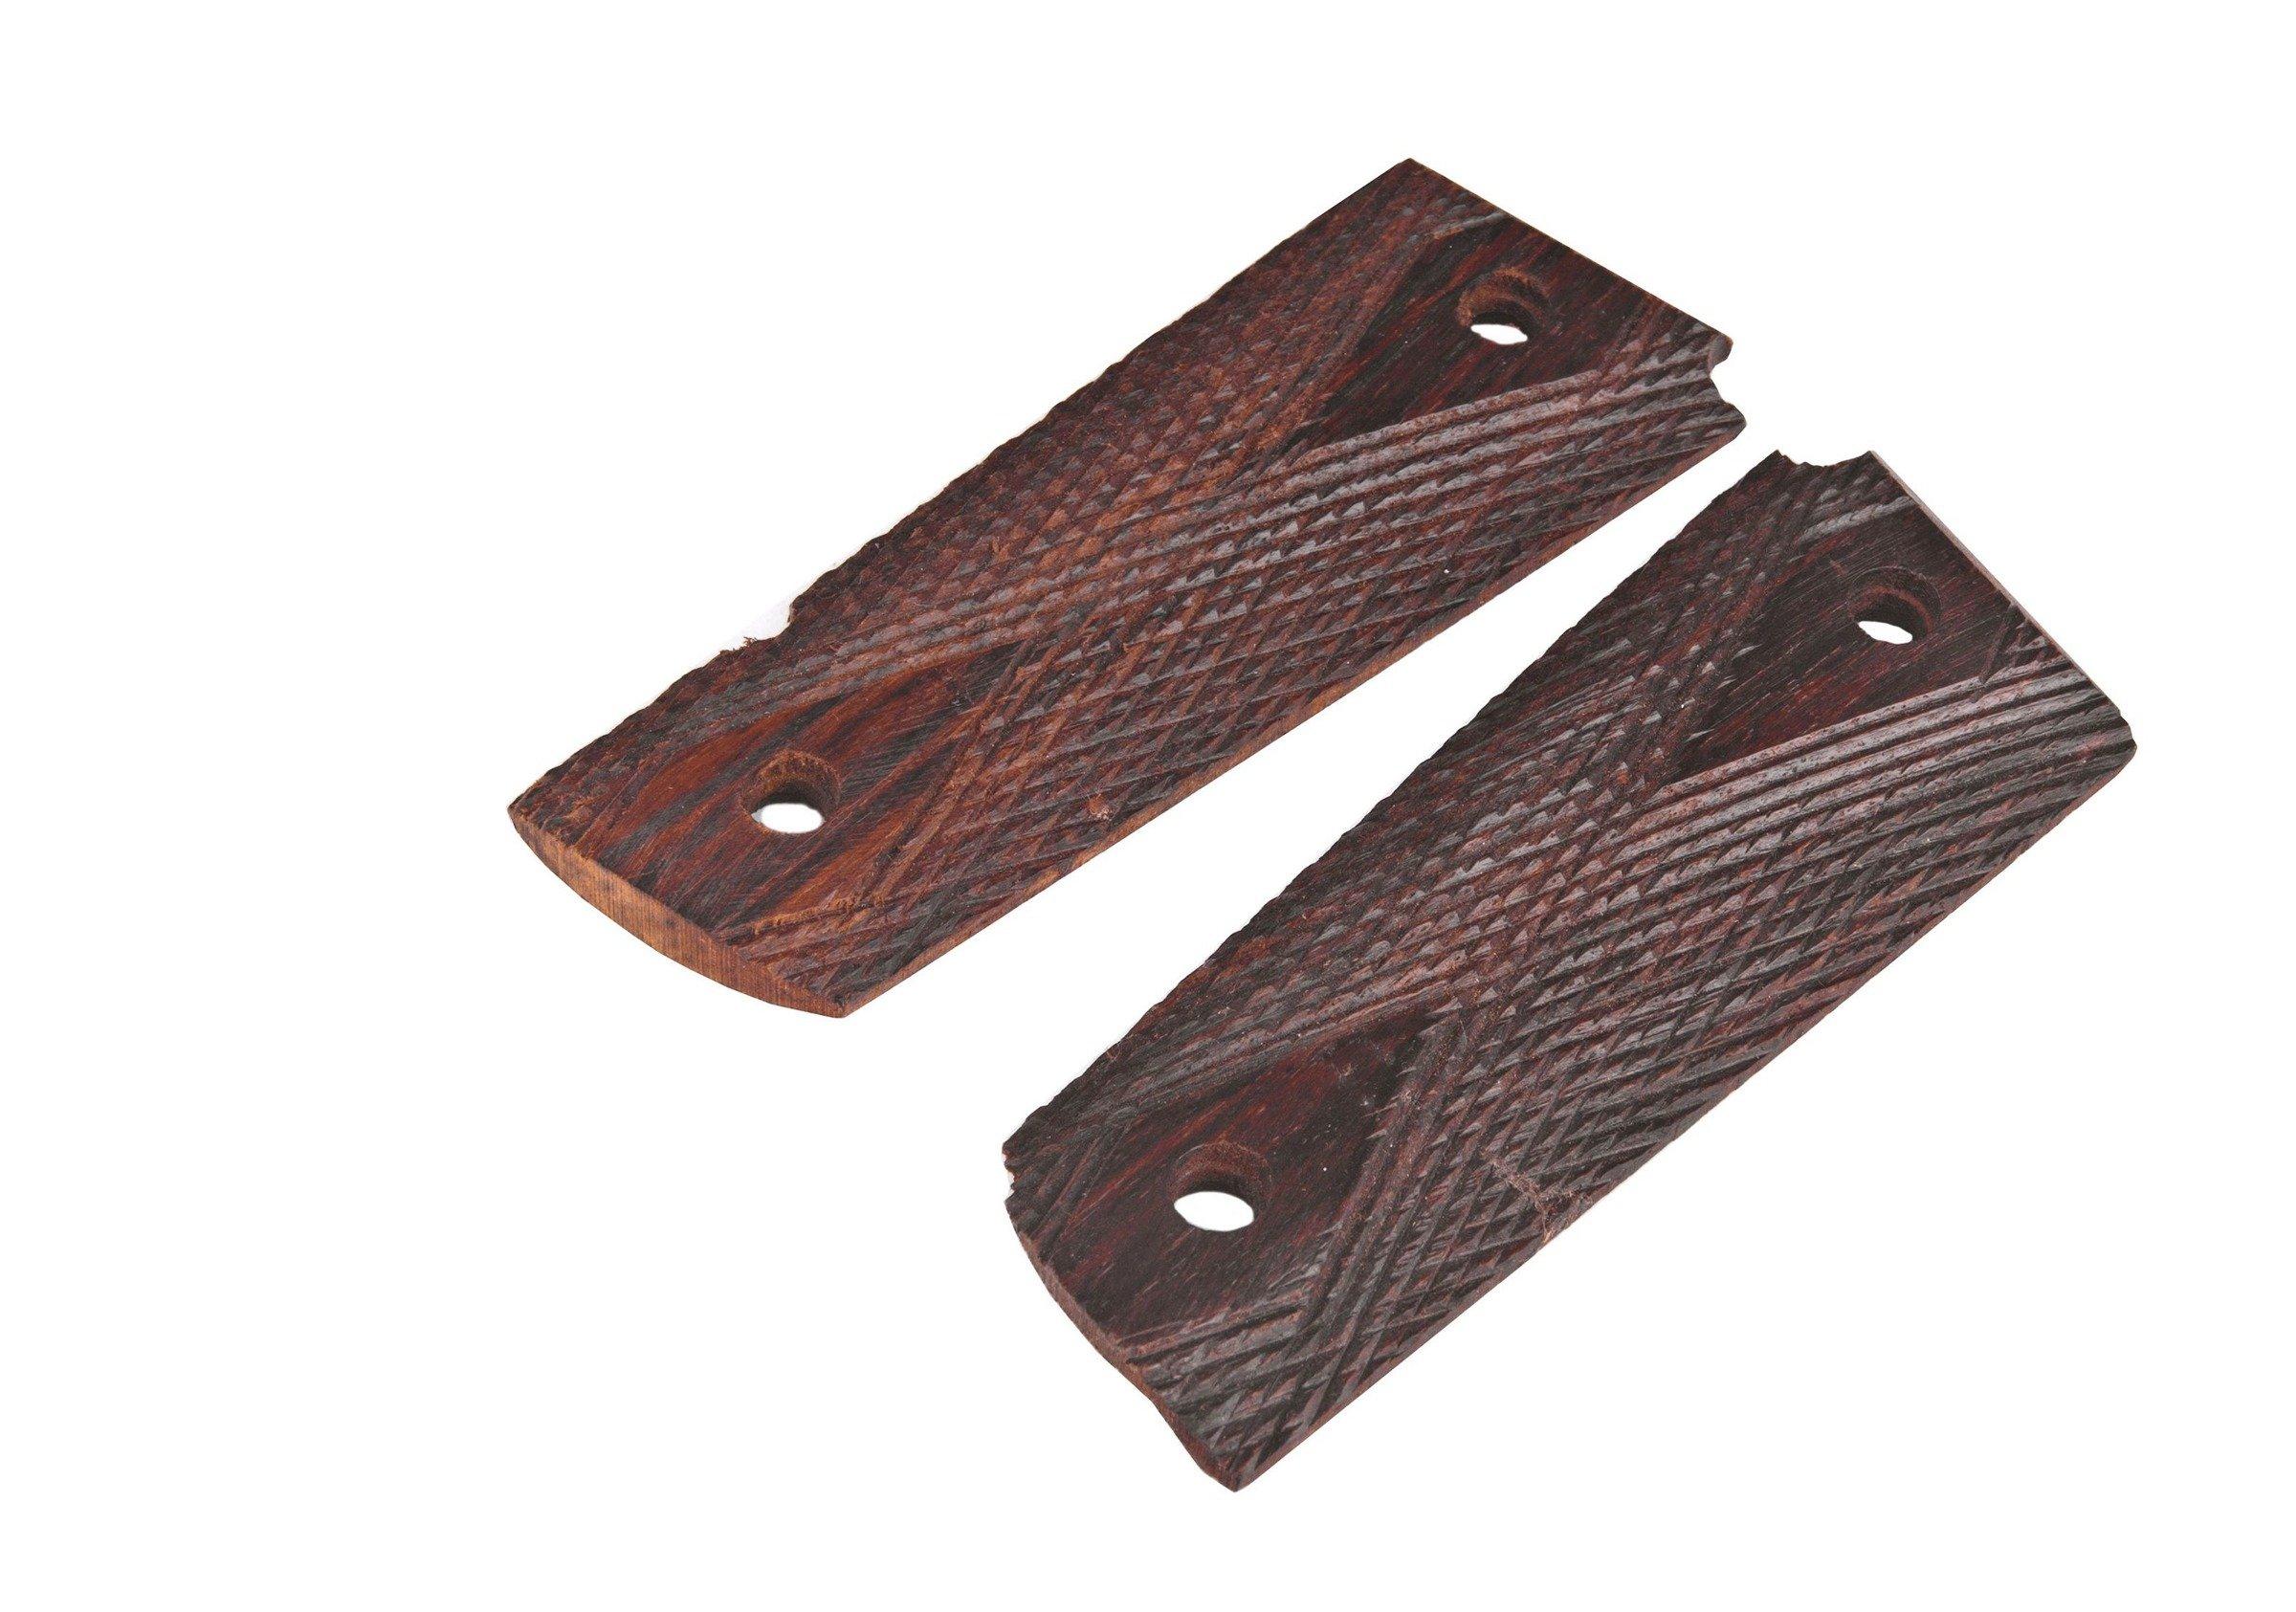 Colt 1911 wood hand grips - set - repro